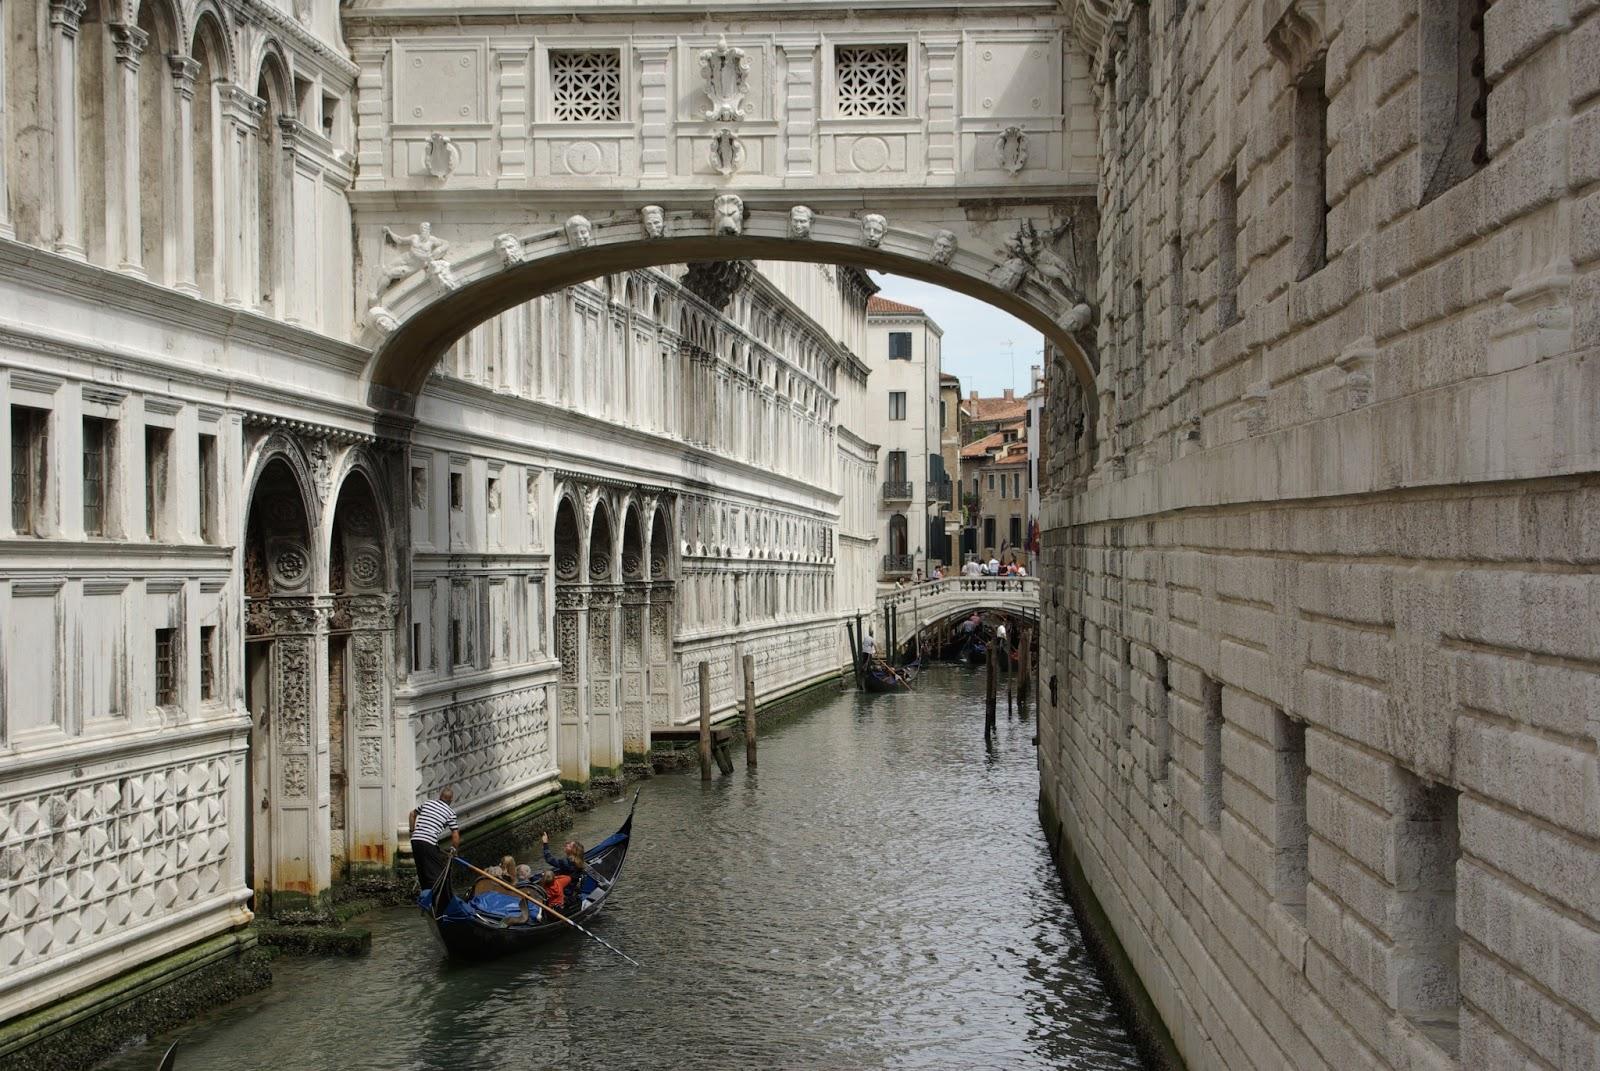 ponte italia europa deuxi me visite venise. Black Bedroom Furniture Sets. Home Design Ideas